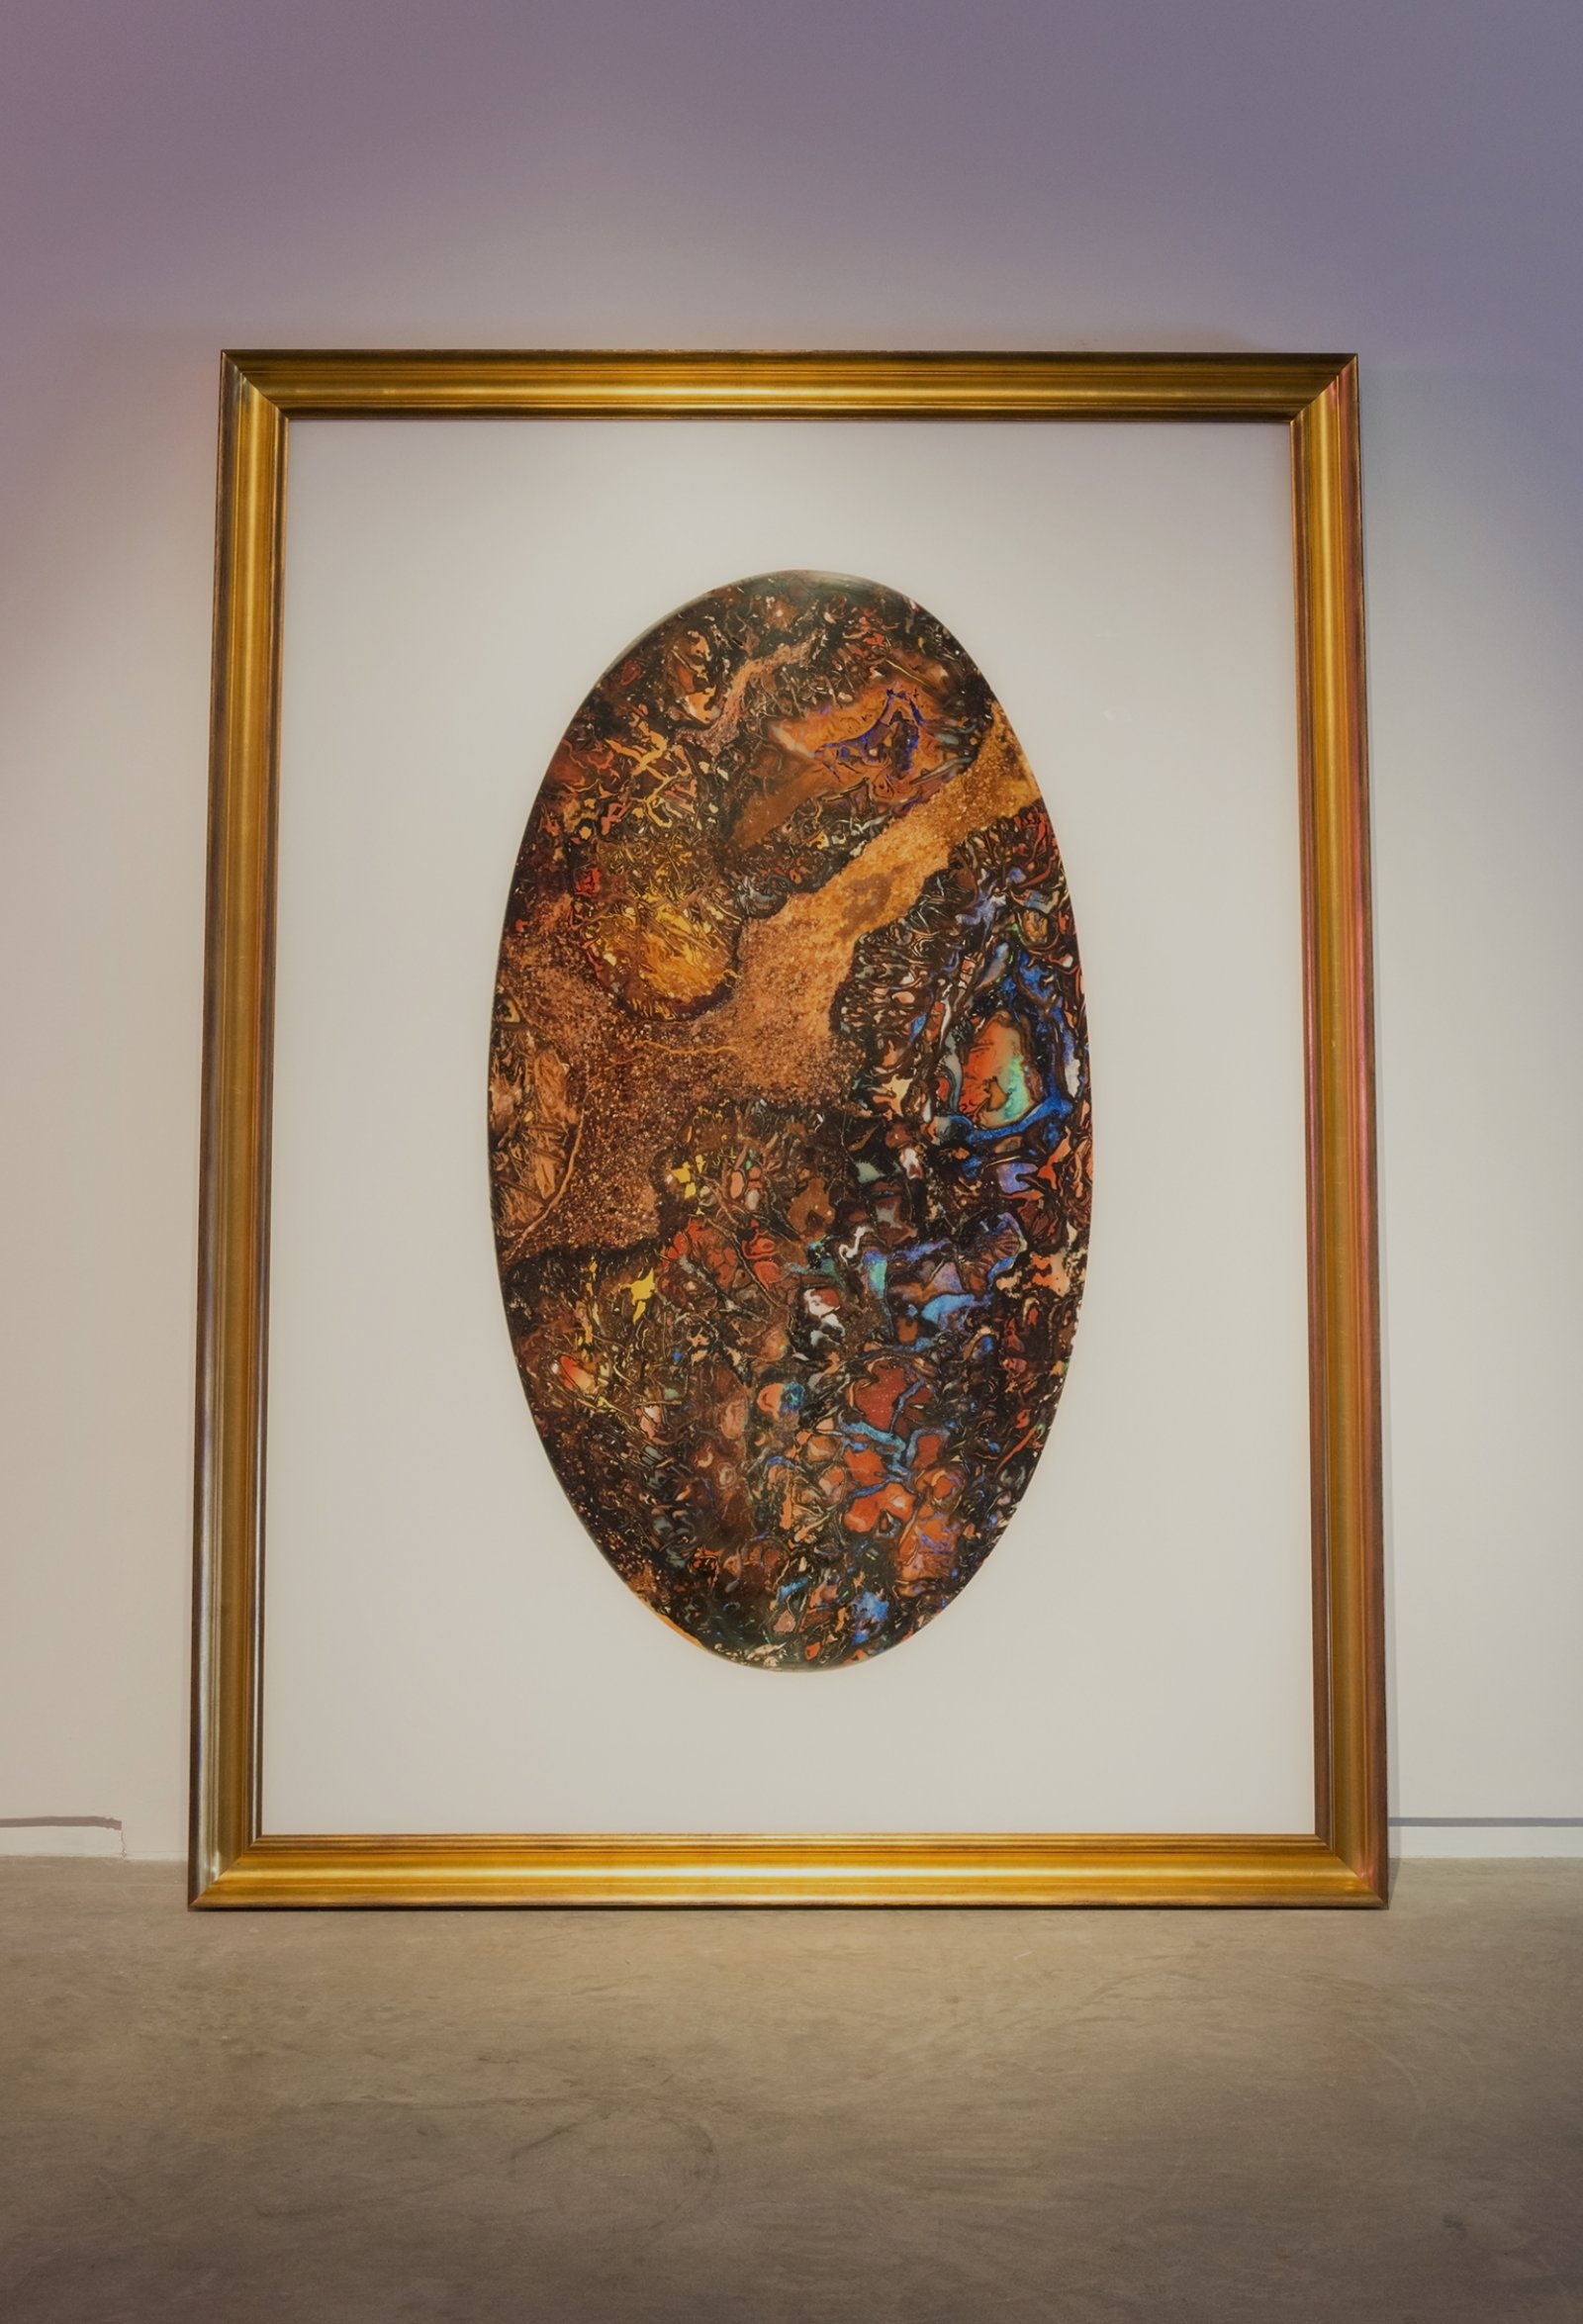 Myfanwy MacLeod, Churinga, 2015, framed transmounted lightjet print, 91 x 62 in. (232 x 158 cm) by Myfanwy MacLeod